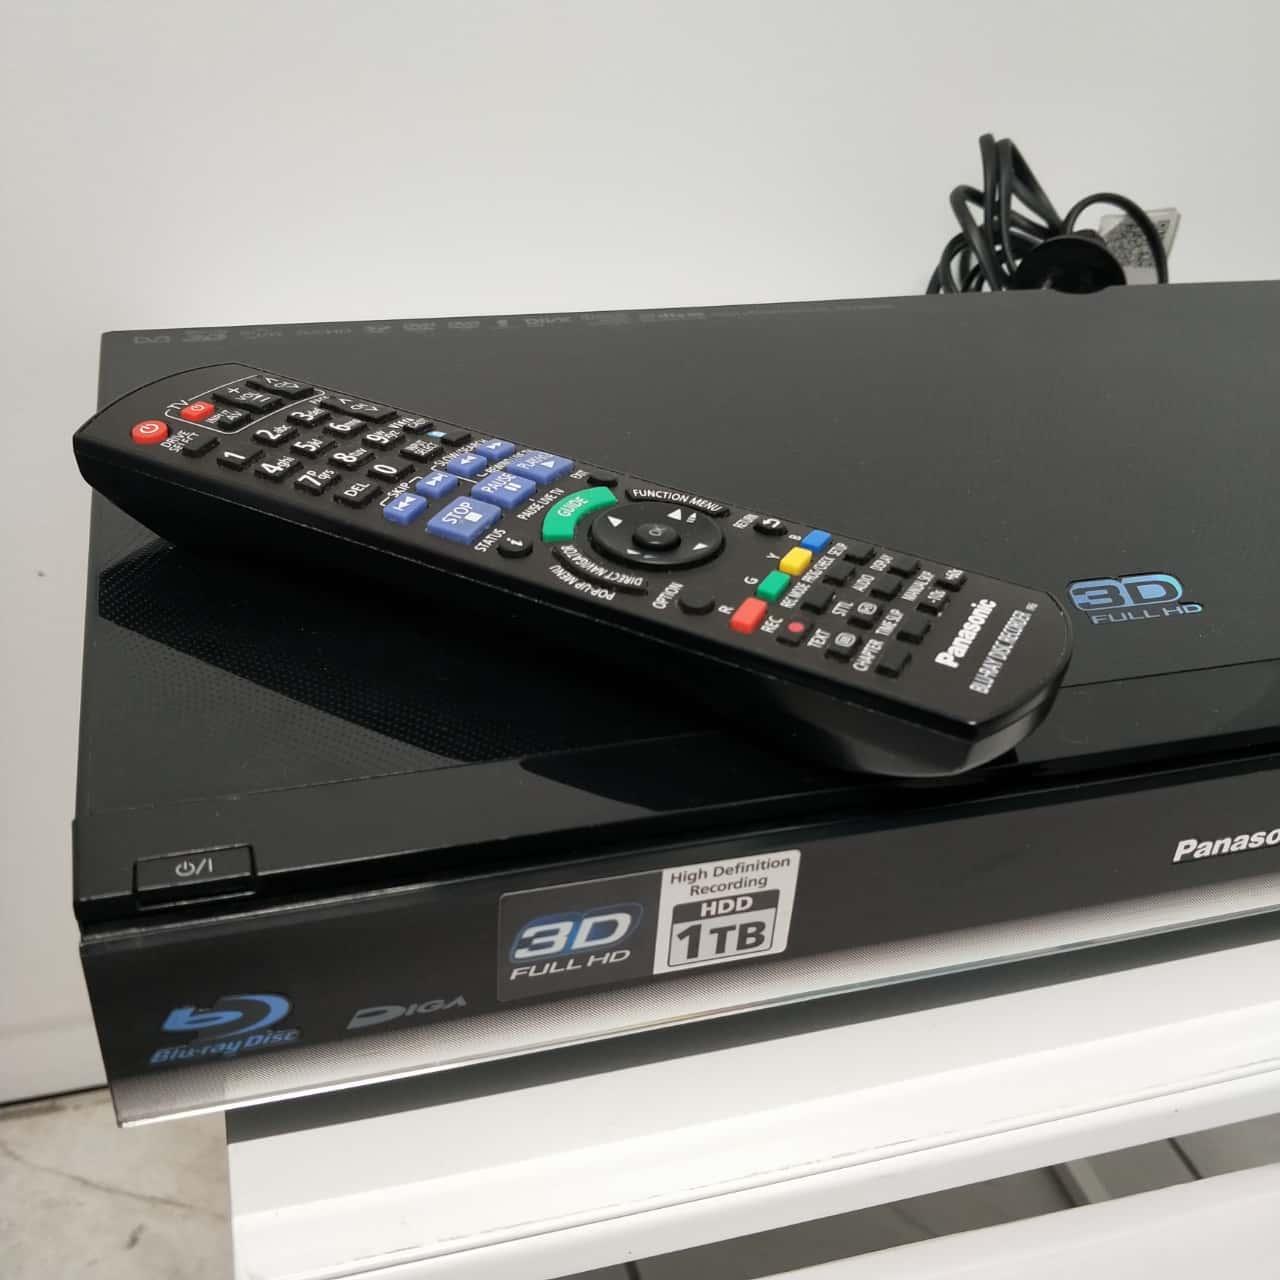 Panasonic Twin HD Digital Tuner Blu-Ray Recorder Player With 1TB Hard Drive